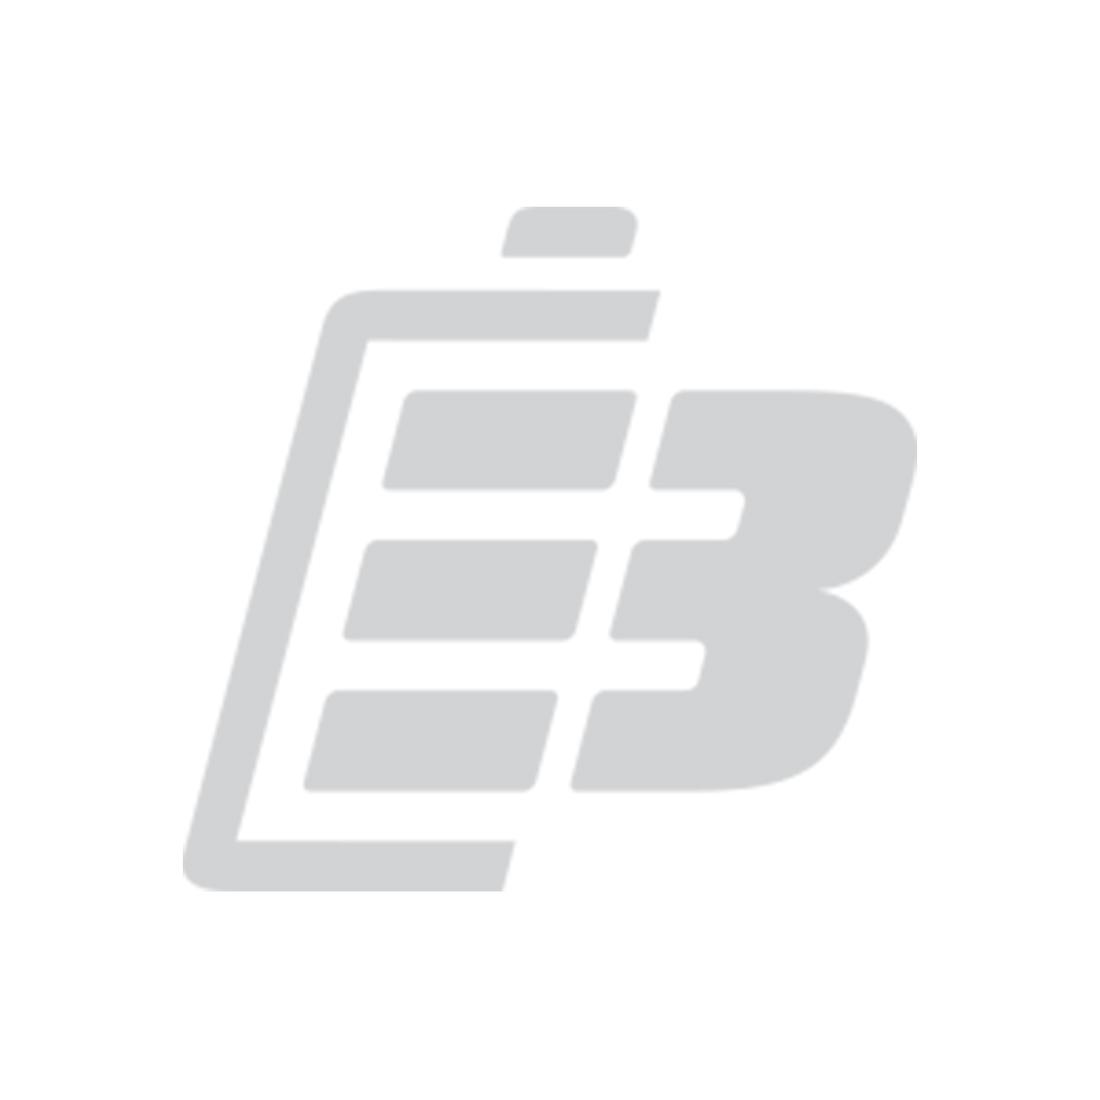 Barcode scanner battery Casio IT-3000_1